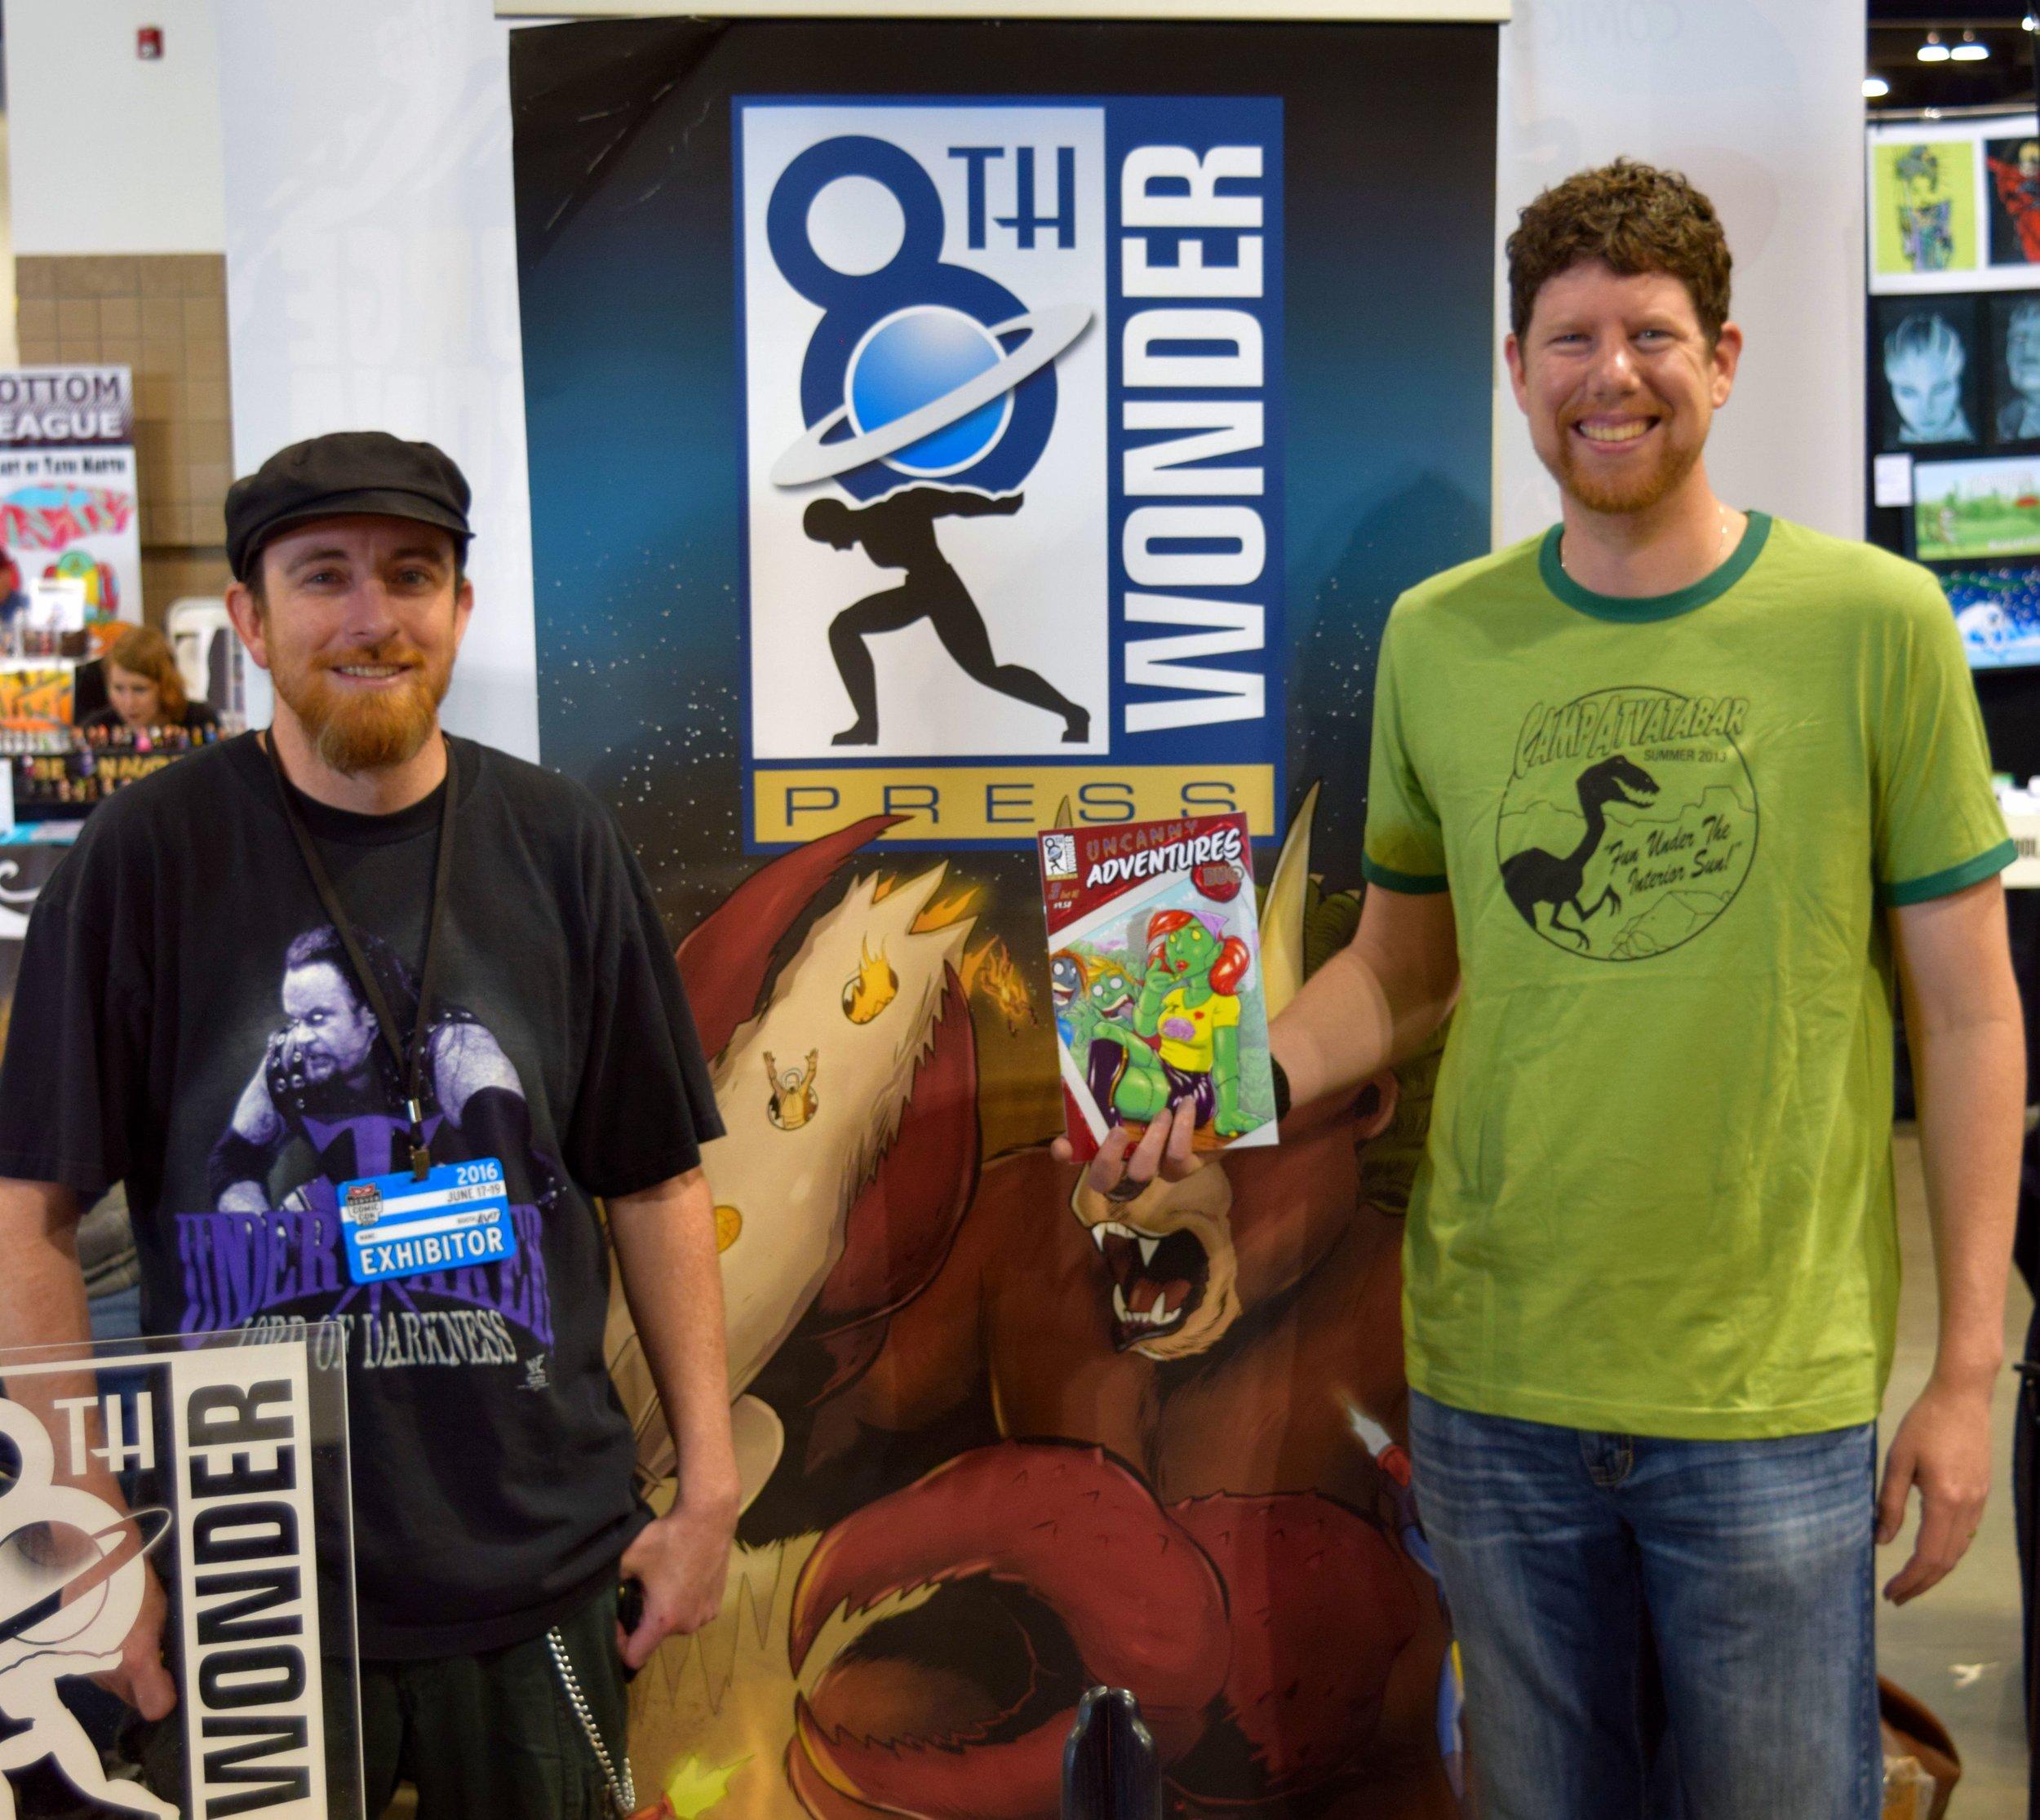 Jesse Dubin & Mister V at Denver Comic Con 2016.